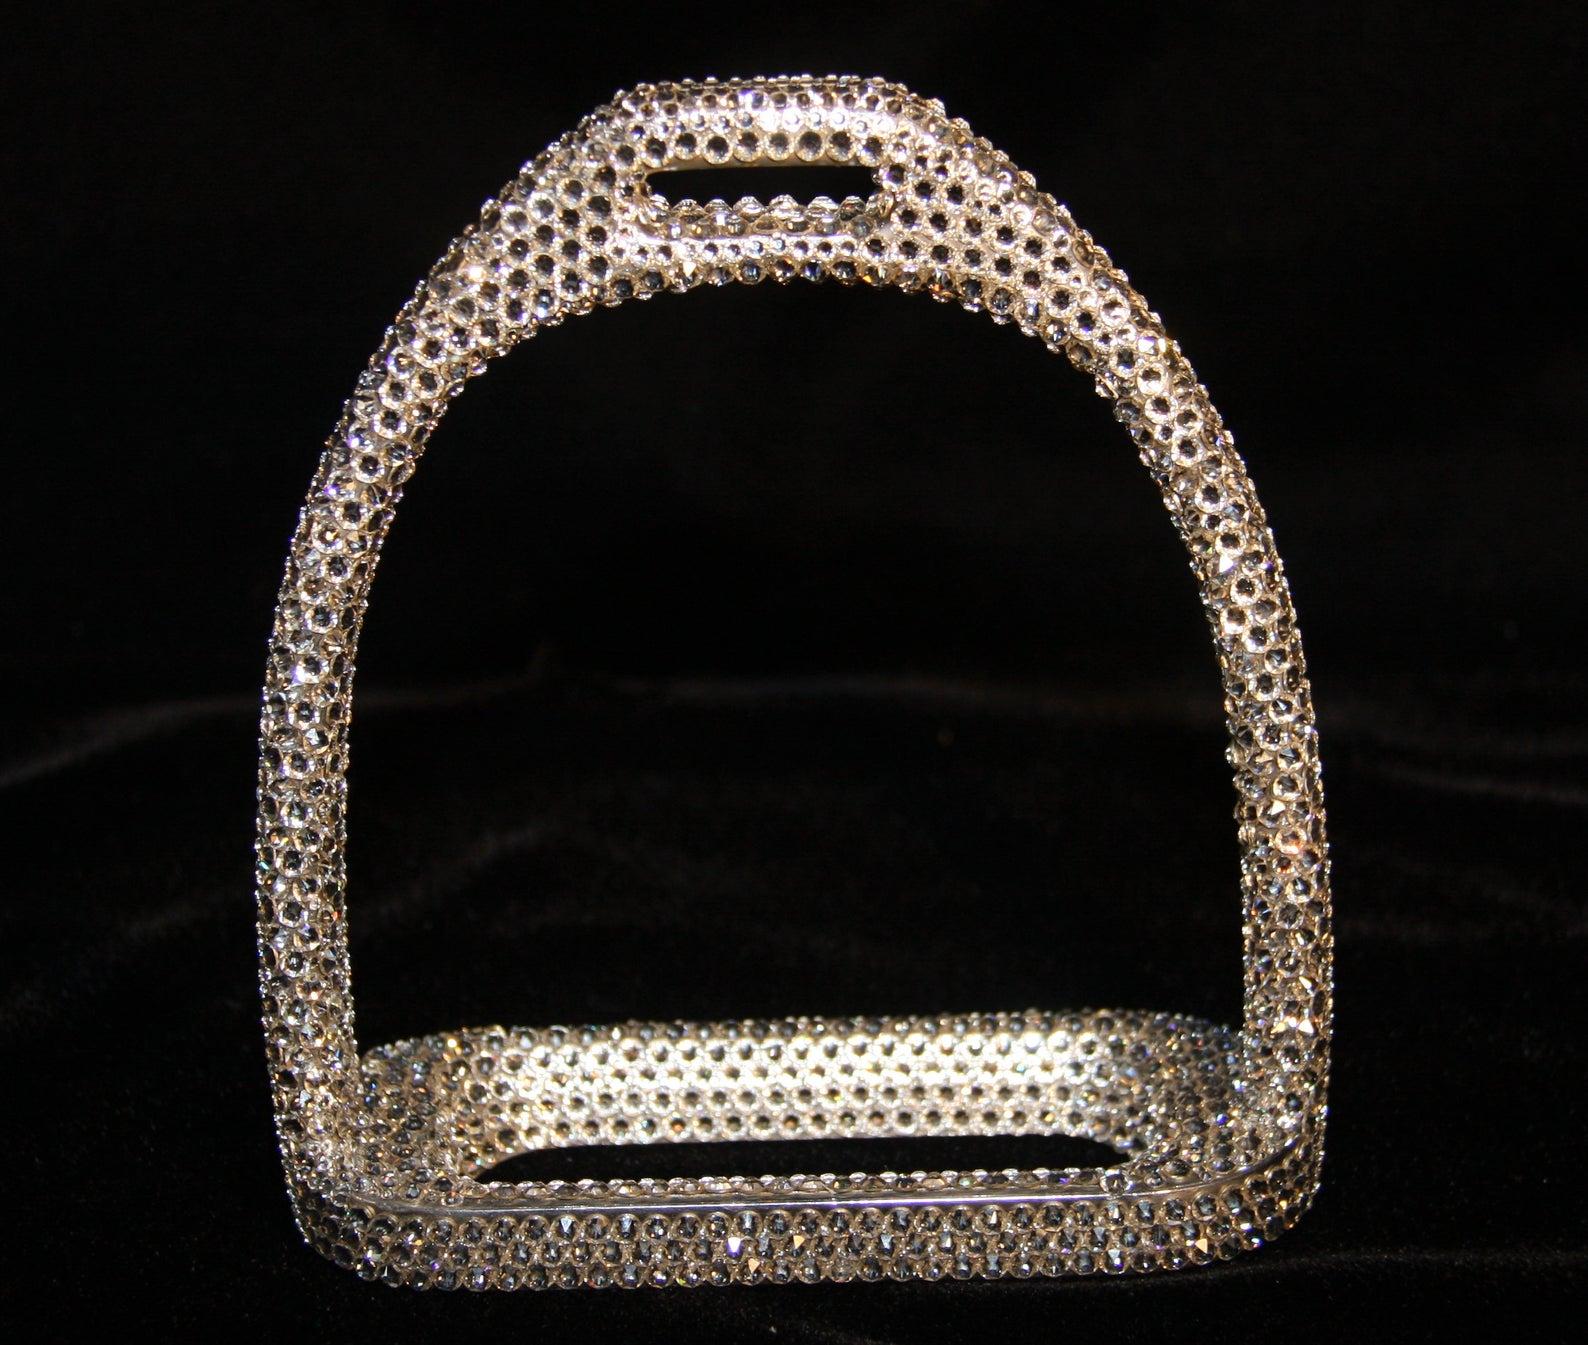 https://www.sparklefox.com/wp-content/uploads/2019/10/Swarovski-Stirrup-Iron.jpg